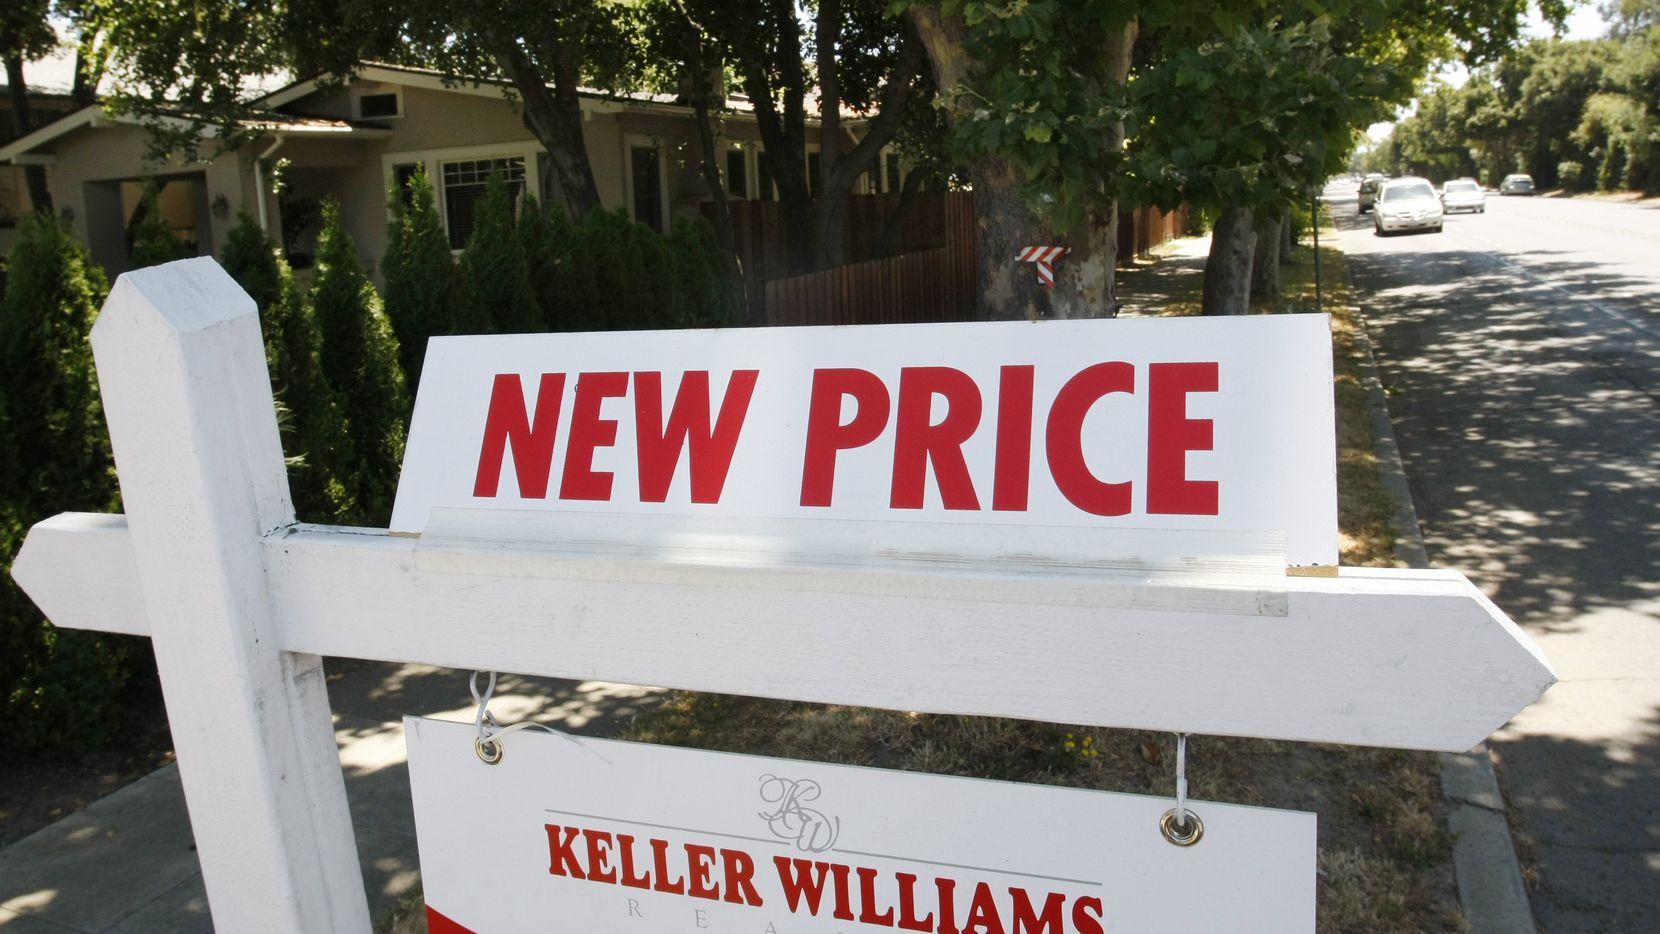 Dallas-area home prices were up 9.3 percent in June.